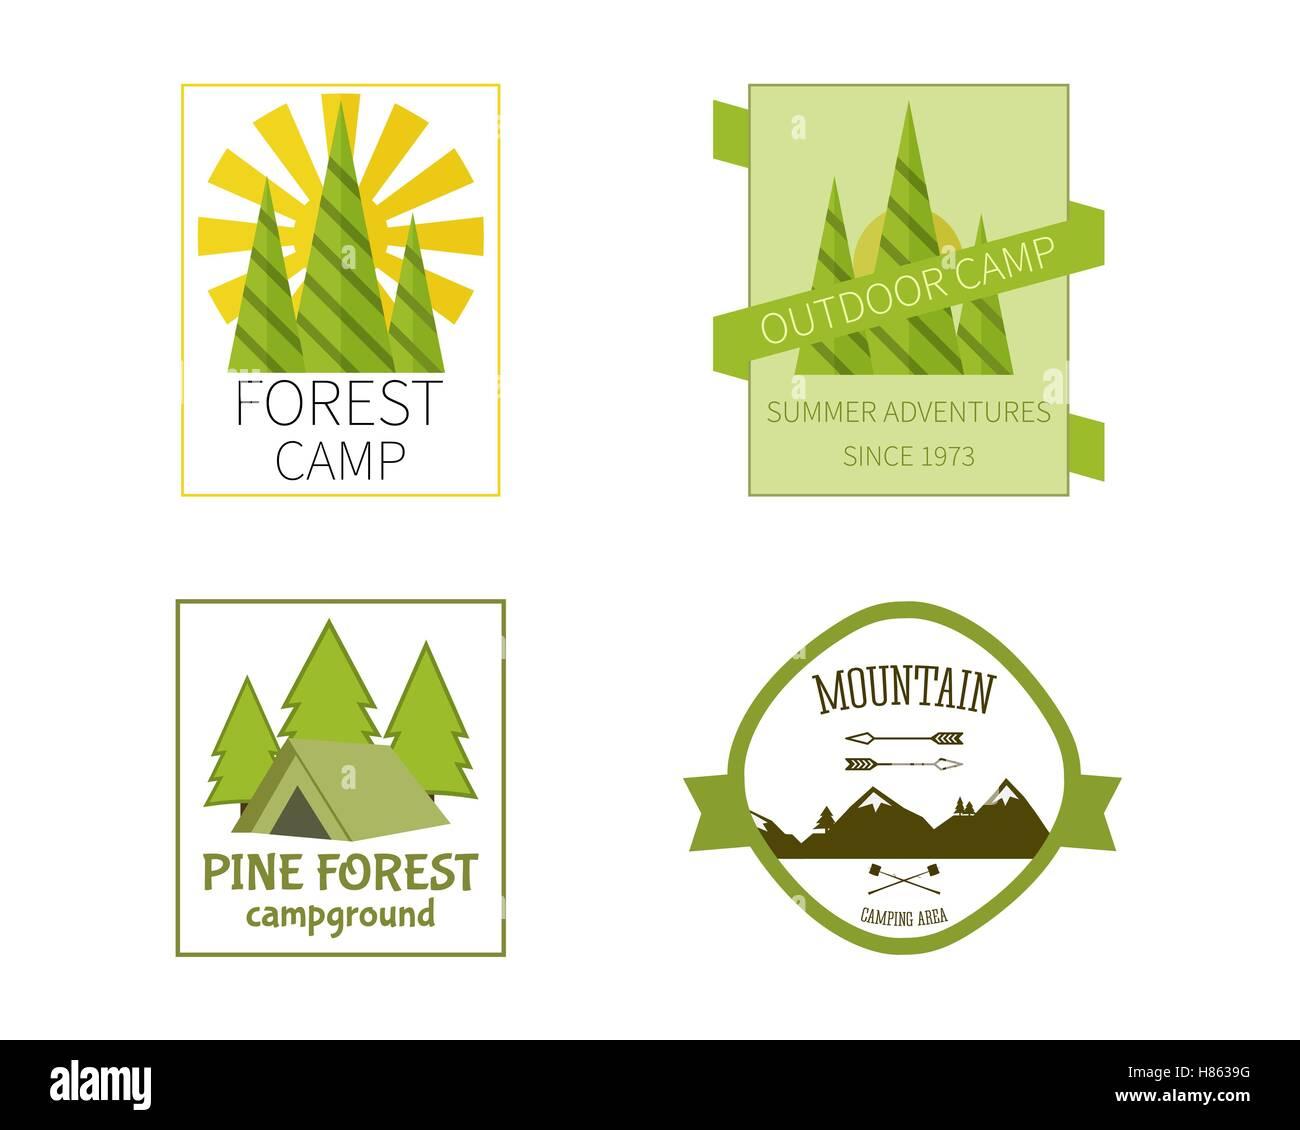 outdoor activity travel logo vintage labels design template forest